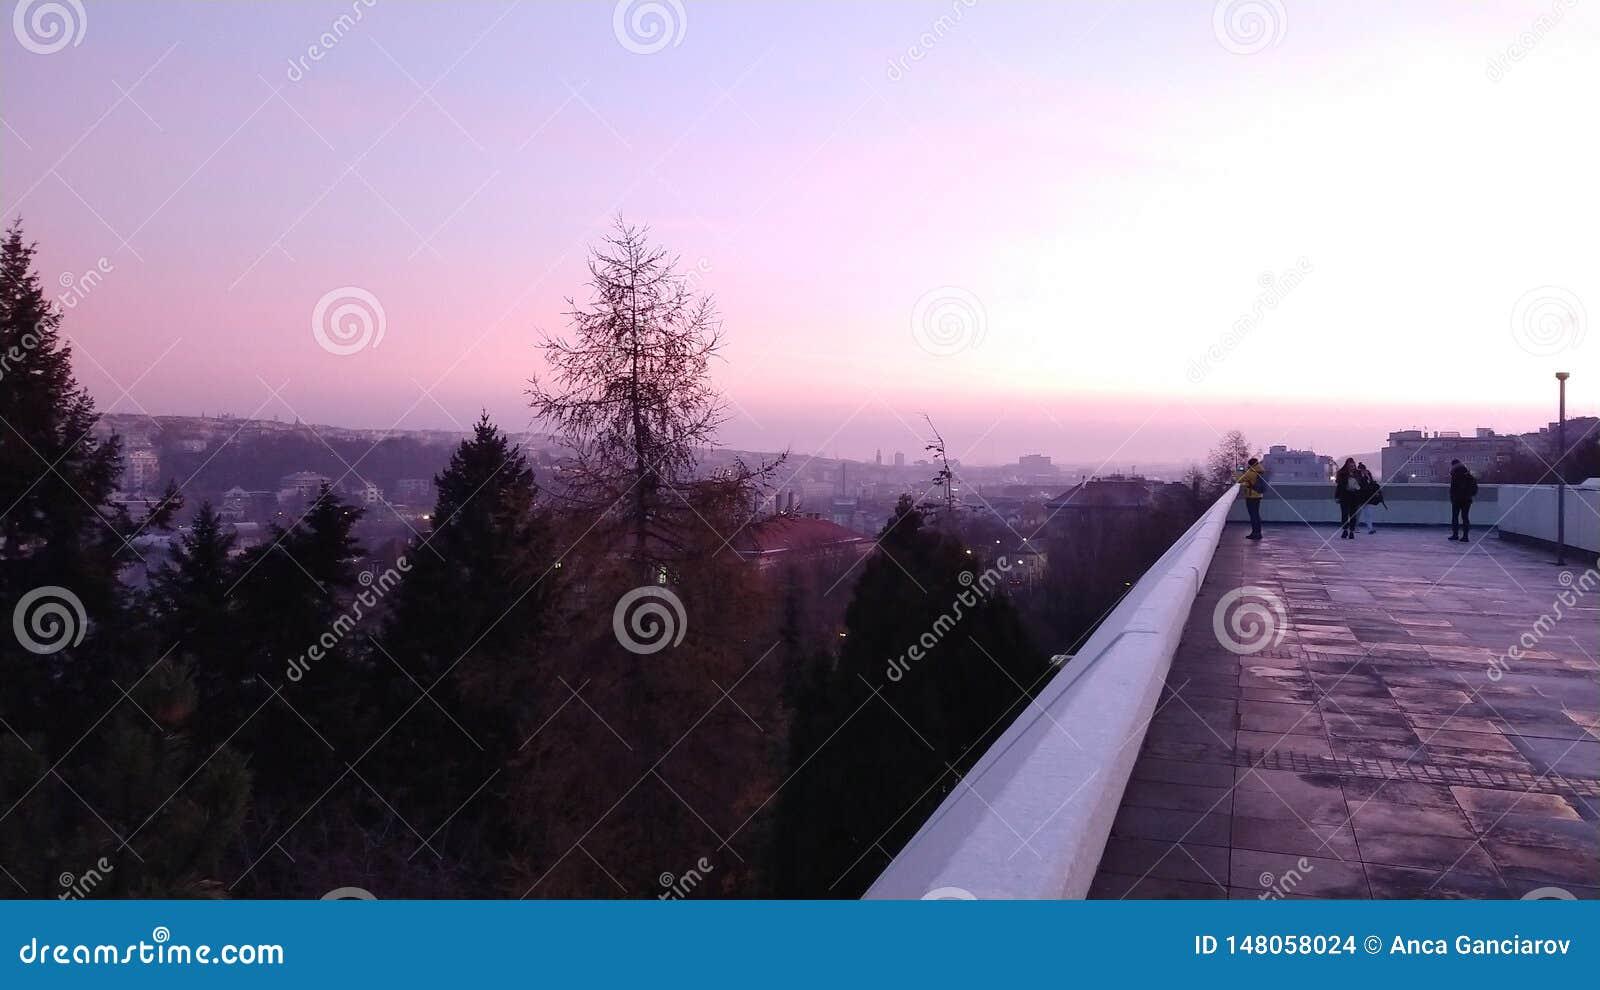 View from Corinthia hotel in Prague, Czechia